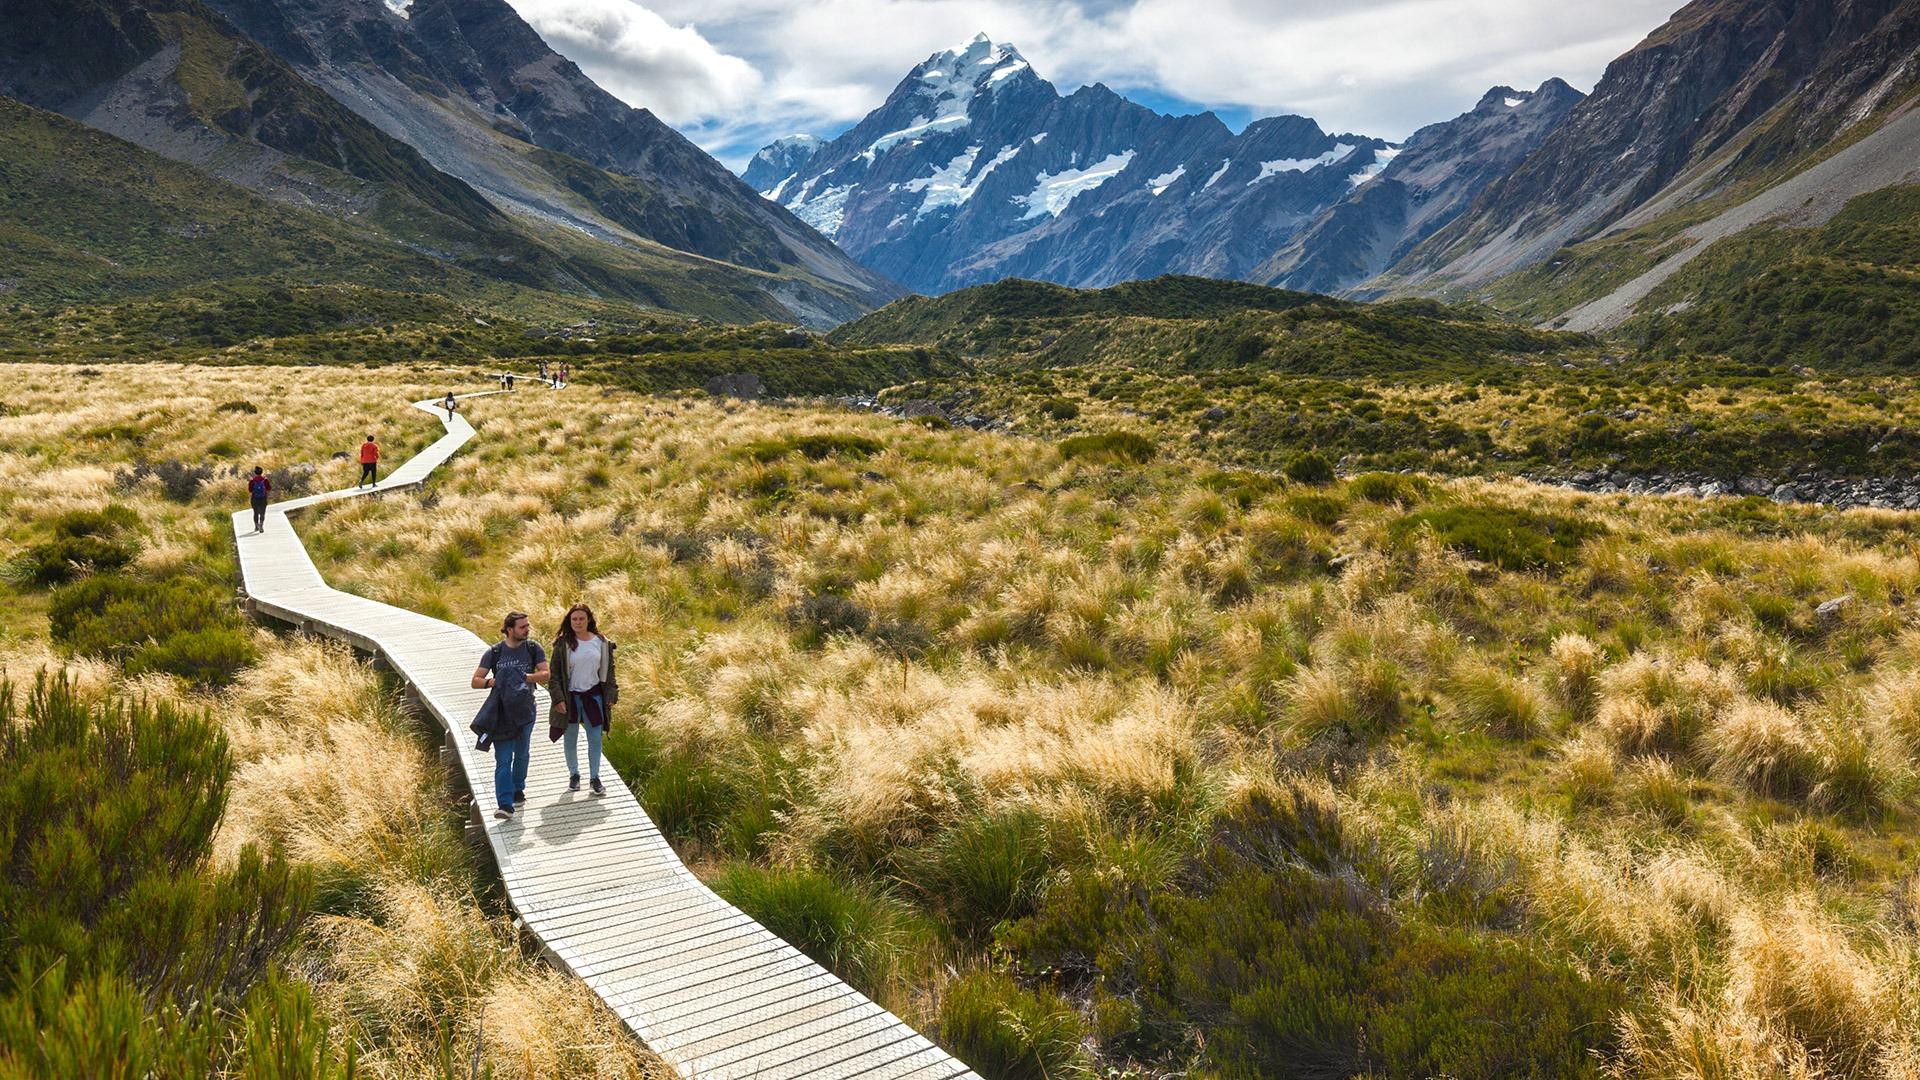 Hooker Valley hike in Aoraki-Mt. Cook National Park, New Zealand